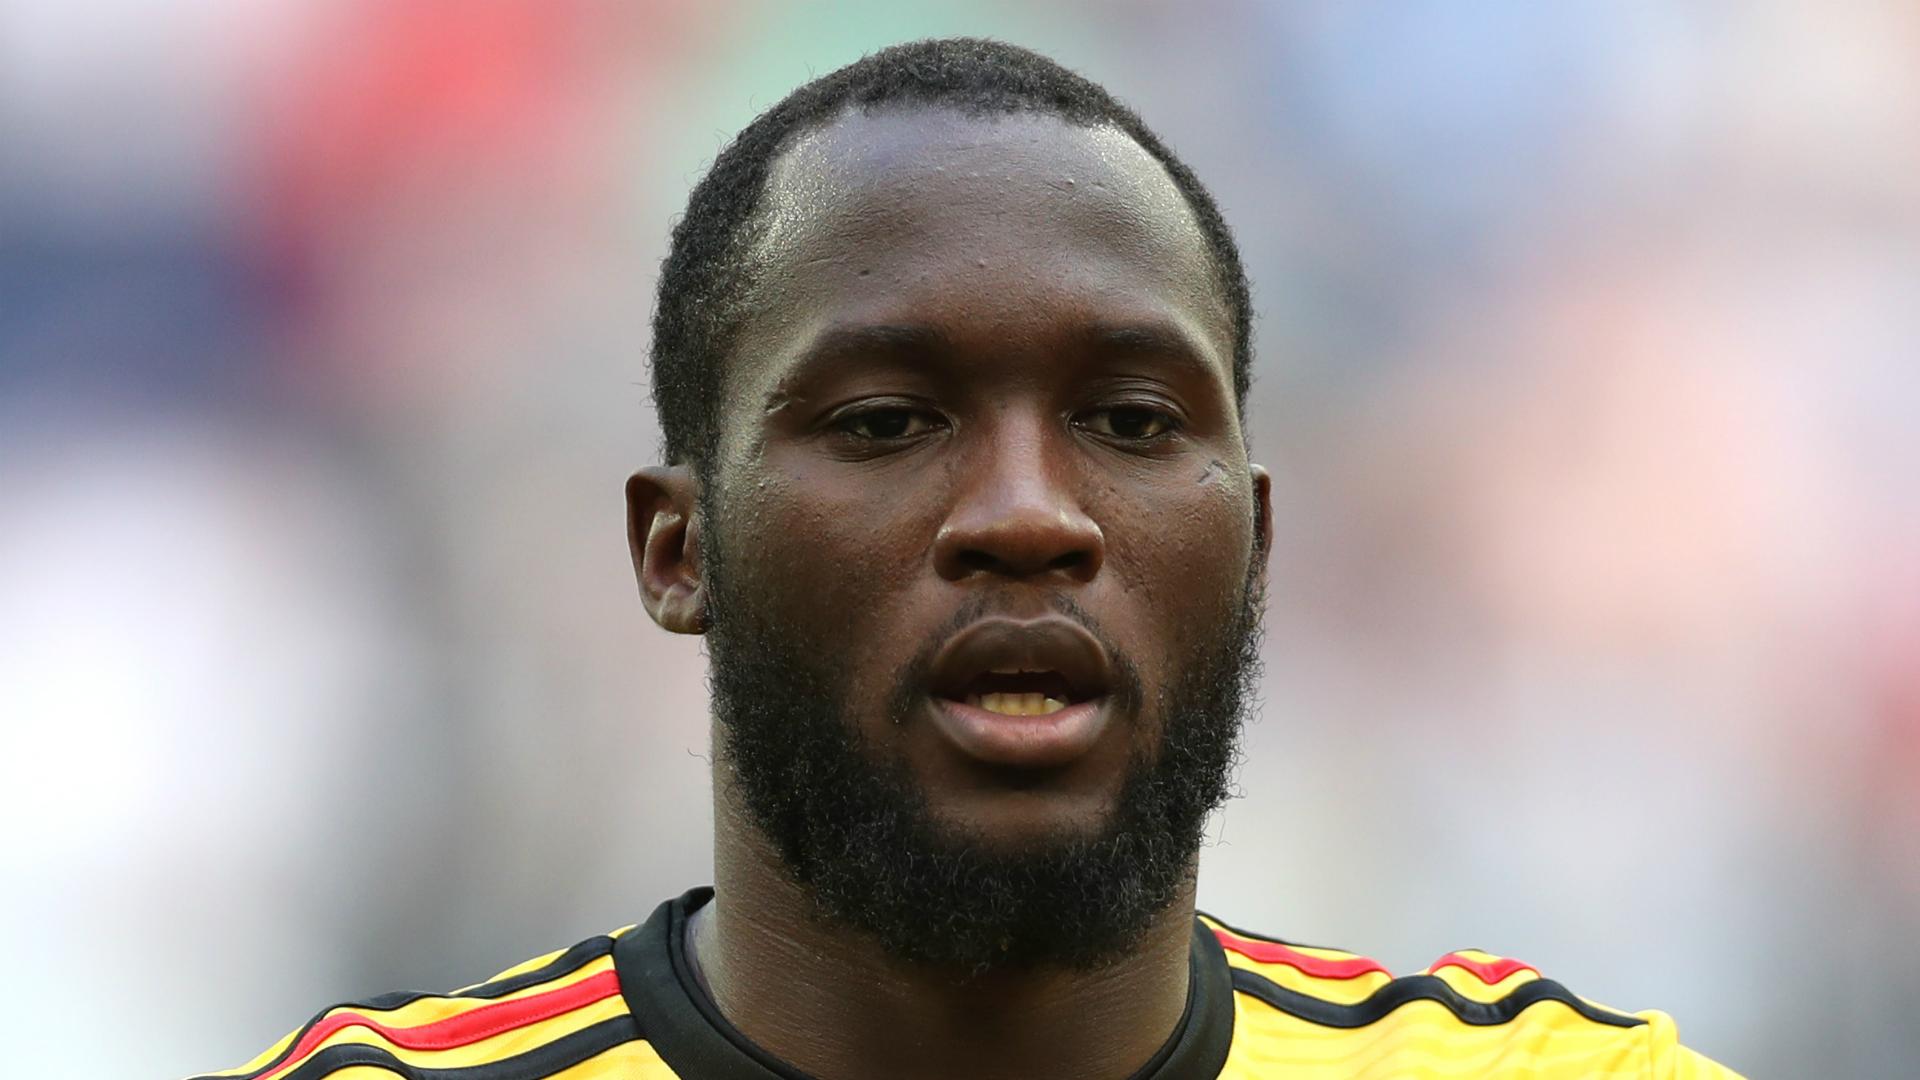 Lukaku out of Russia game, Belgium boss Martinez confirms